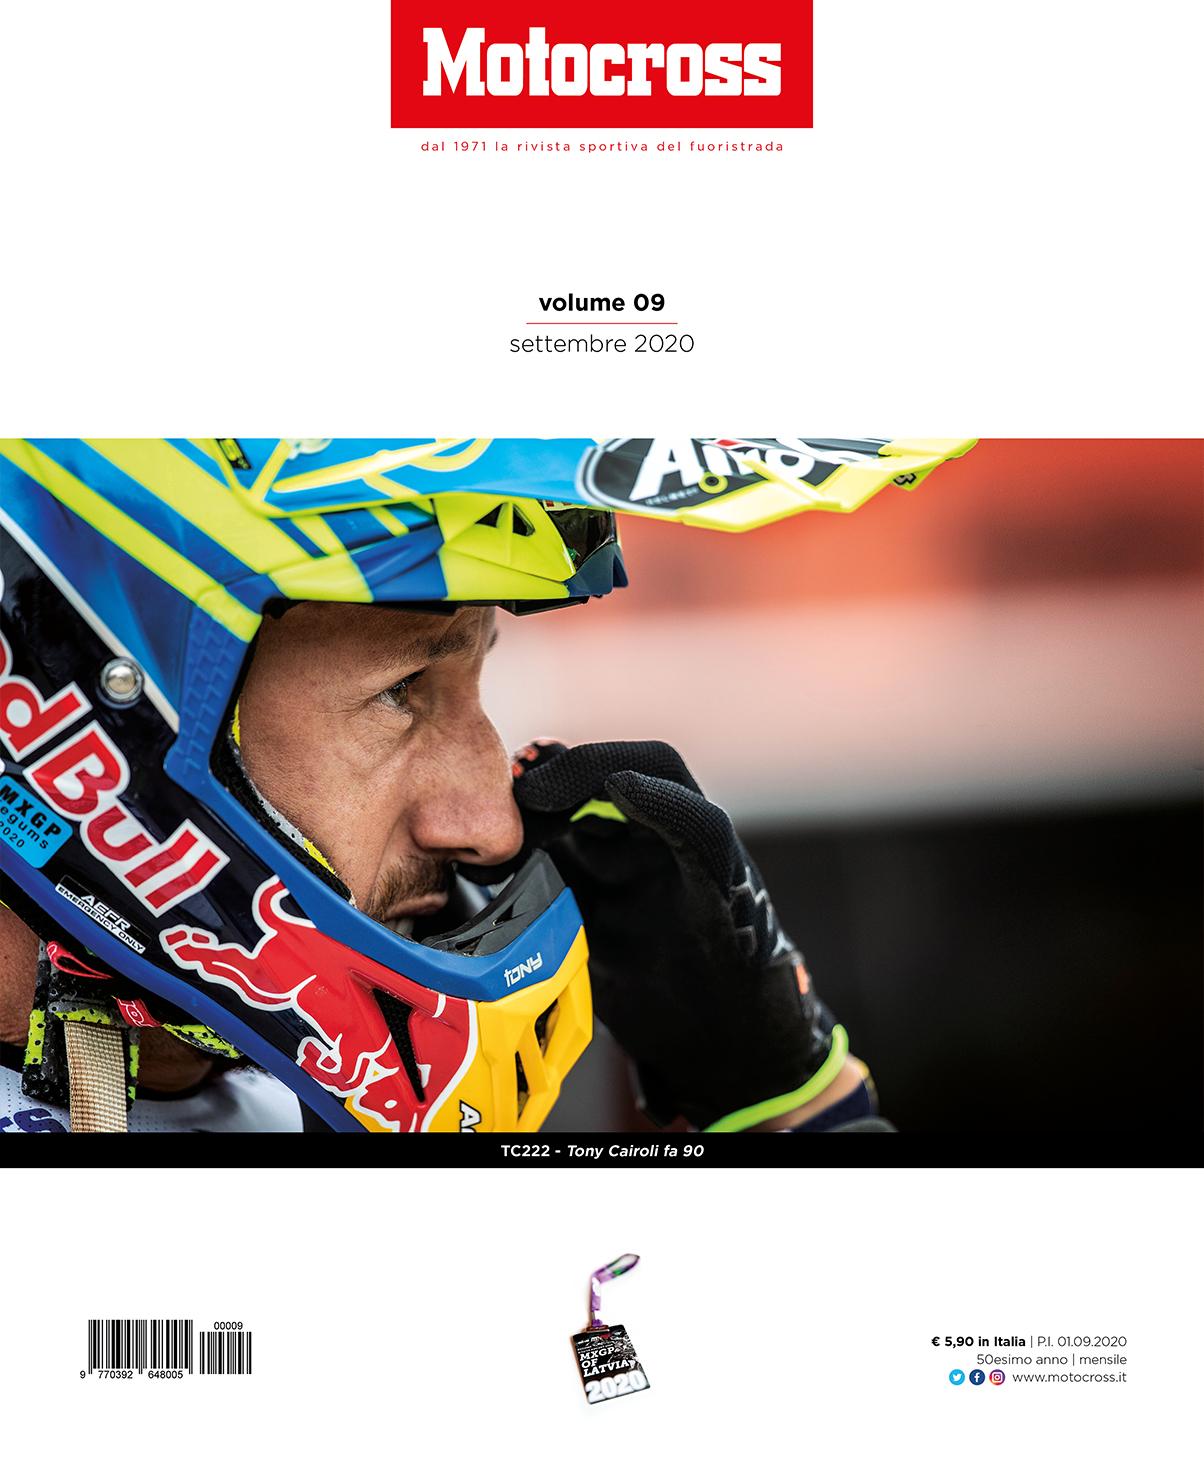 Motocross Settembre 2020